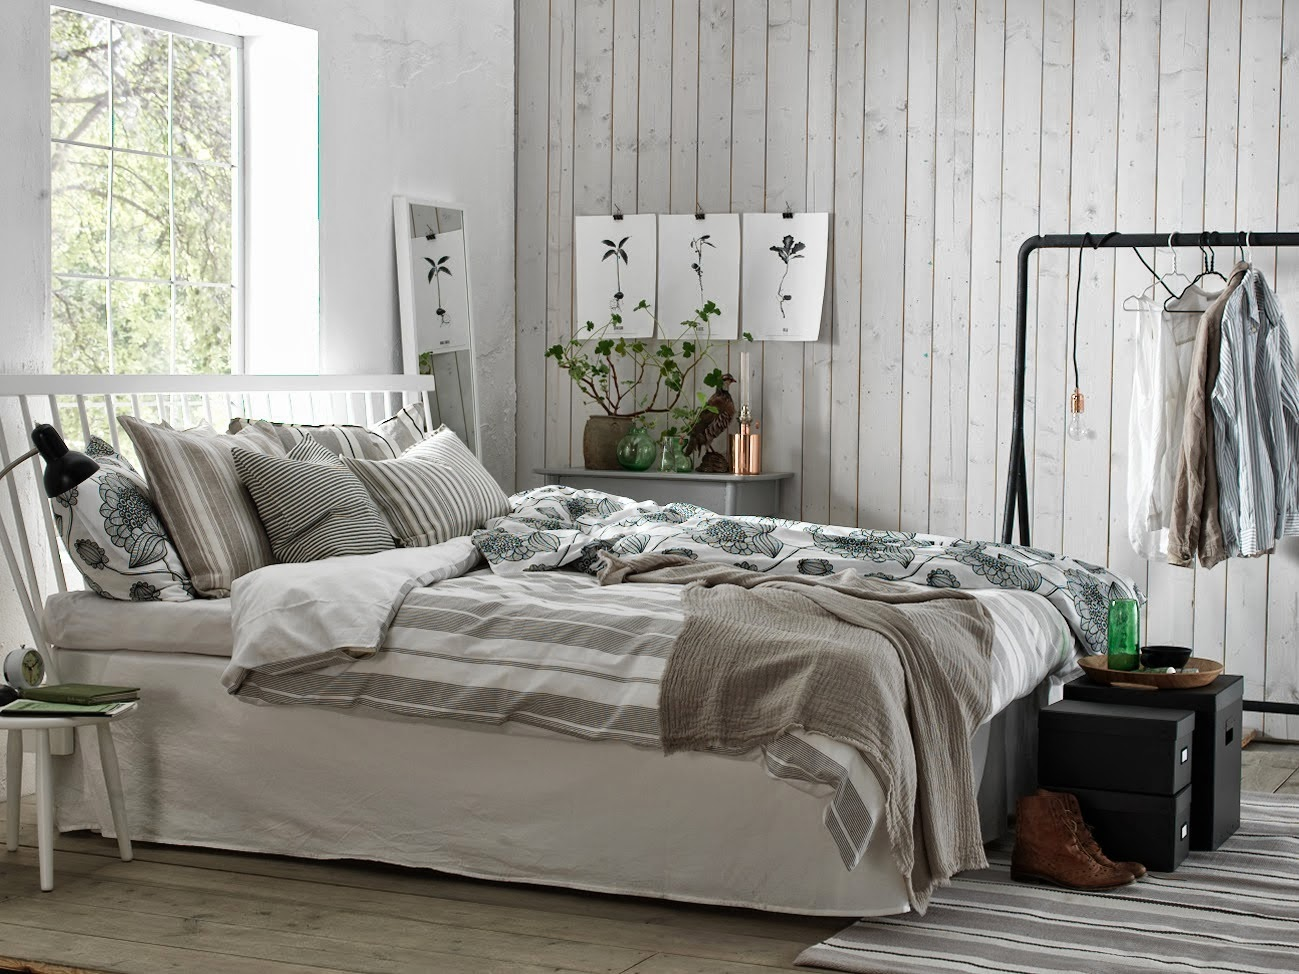 Mitt gröna lilla rum: inred ditt sovrum svalt